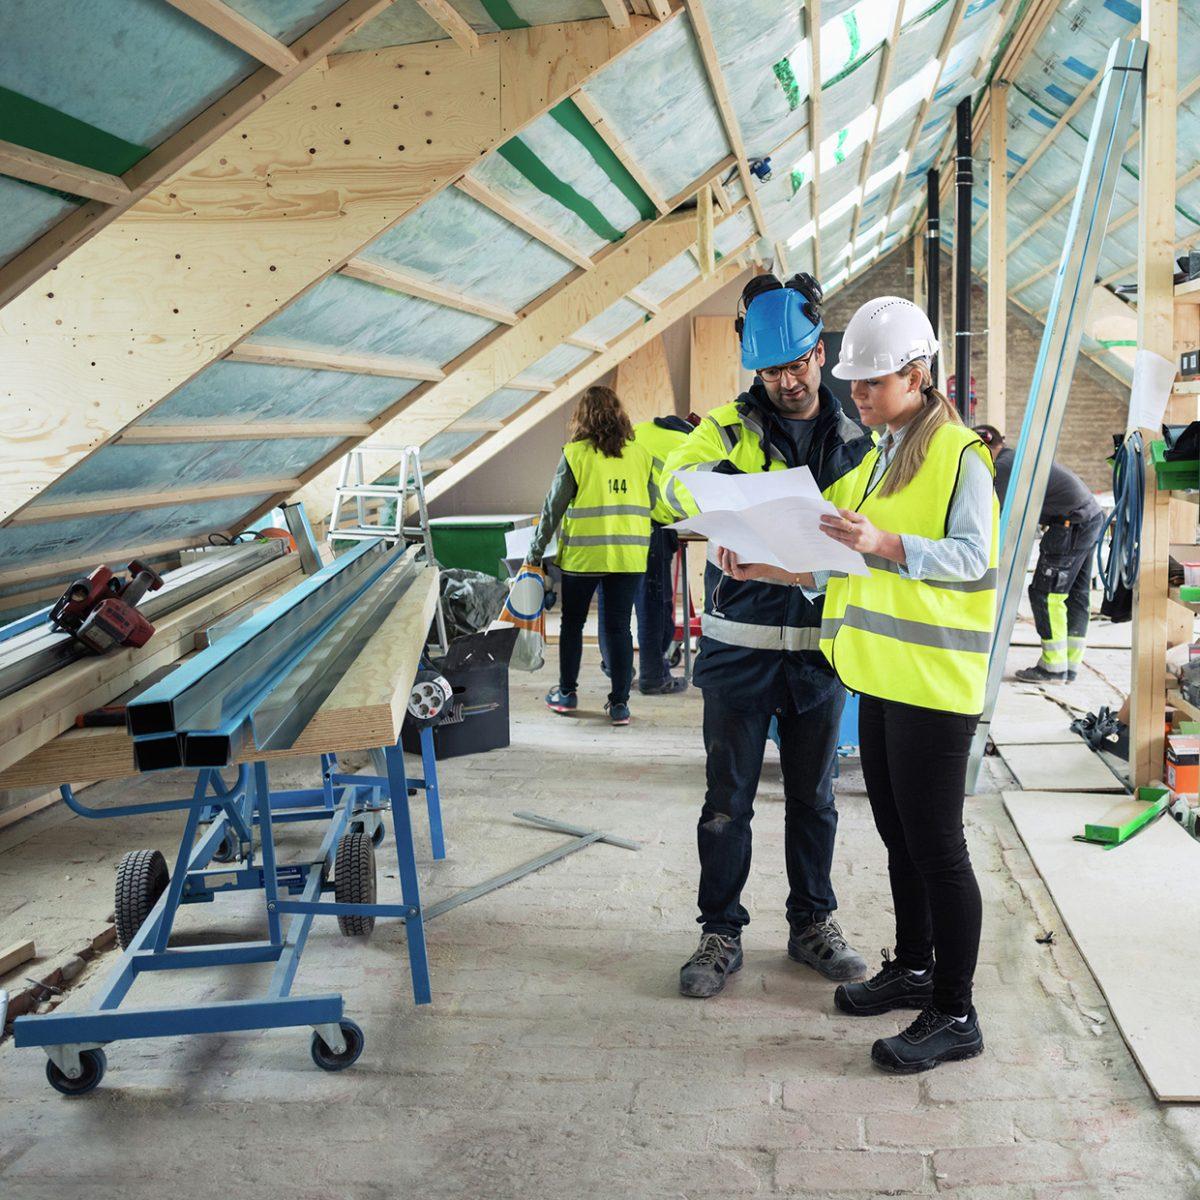 a work team planning repairs